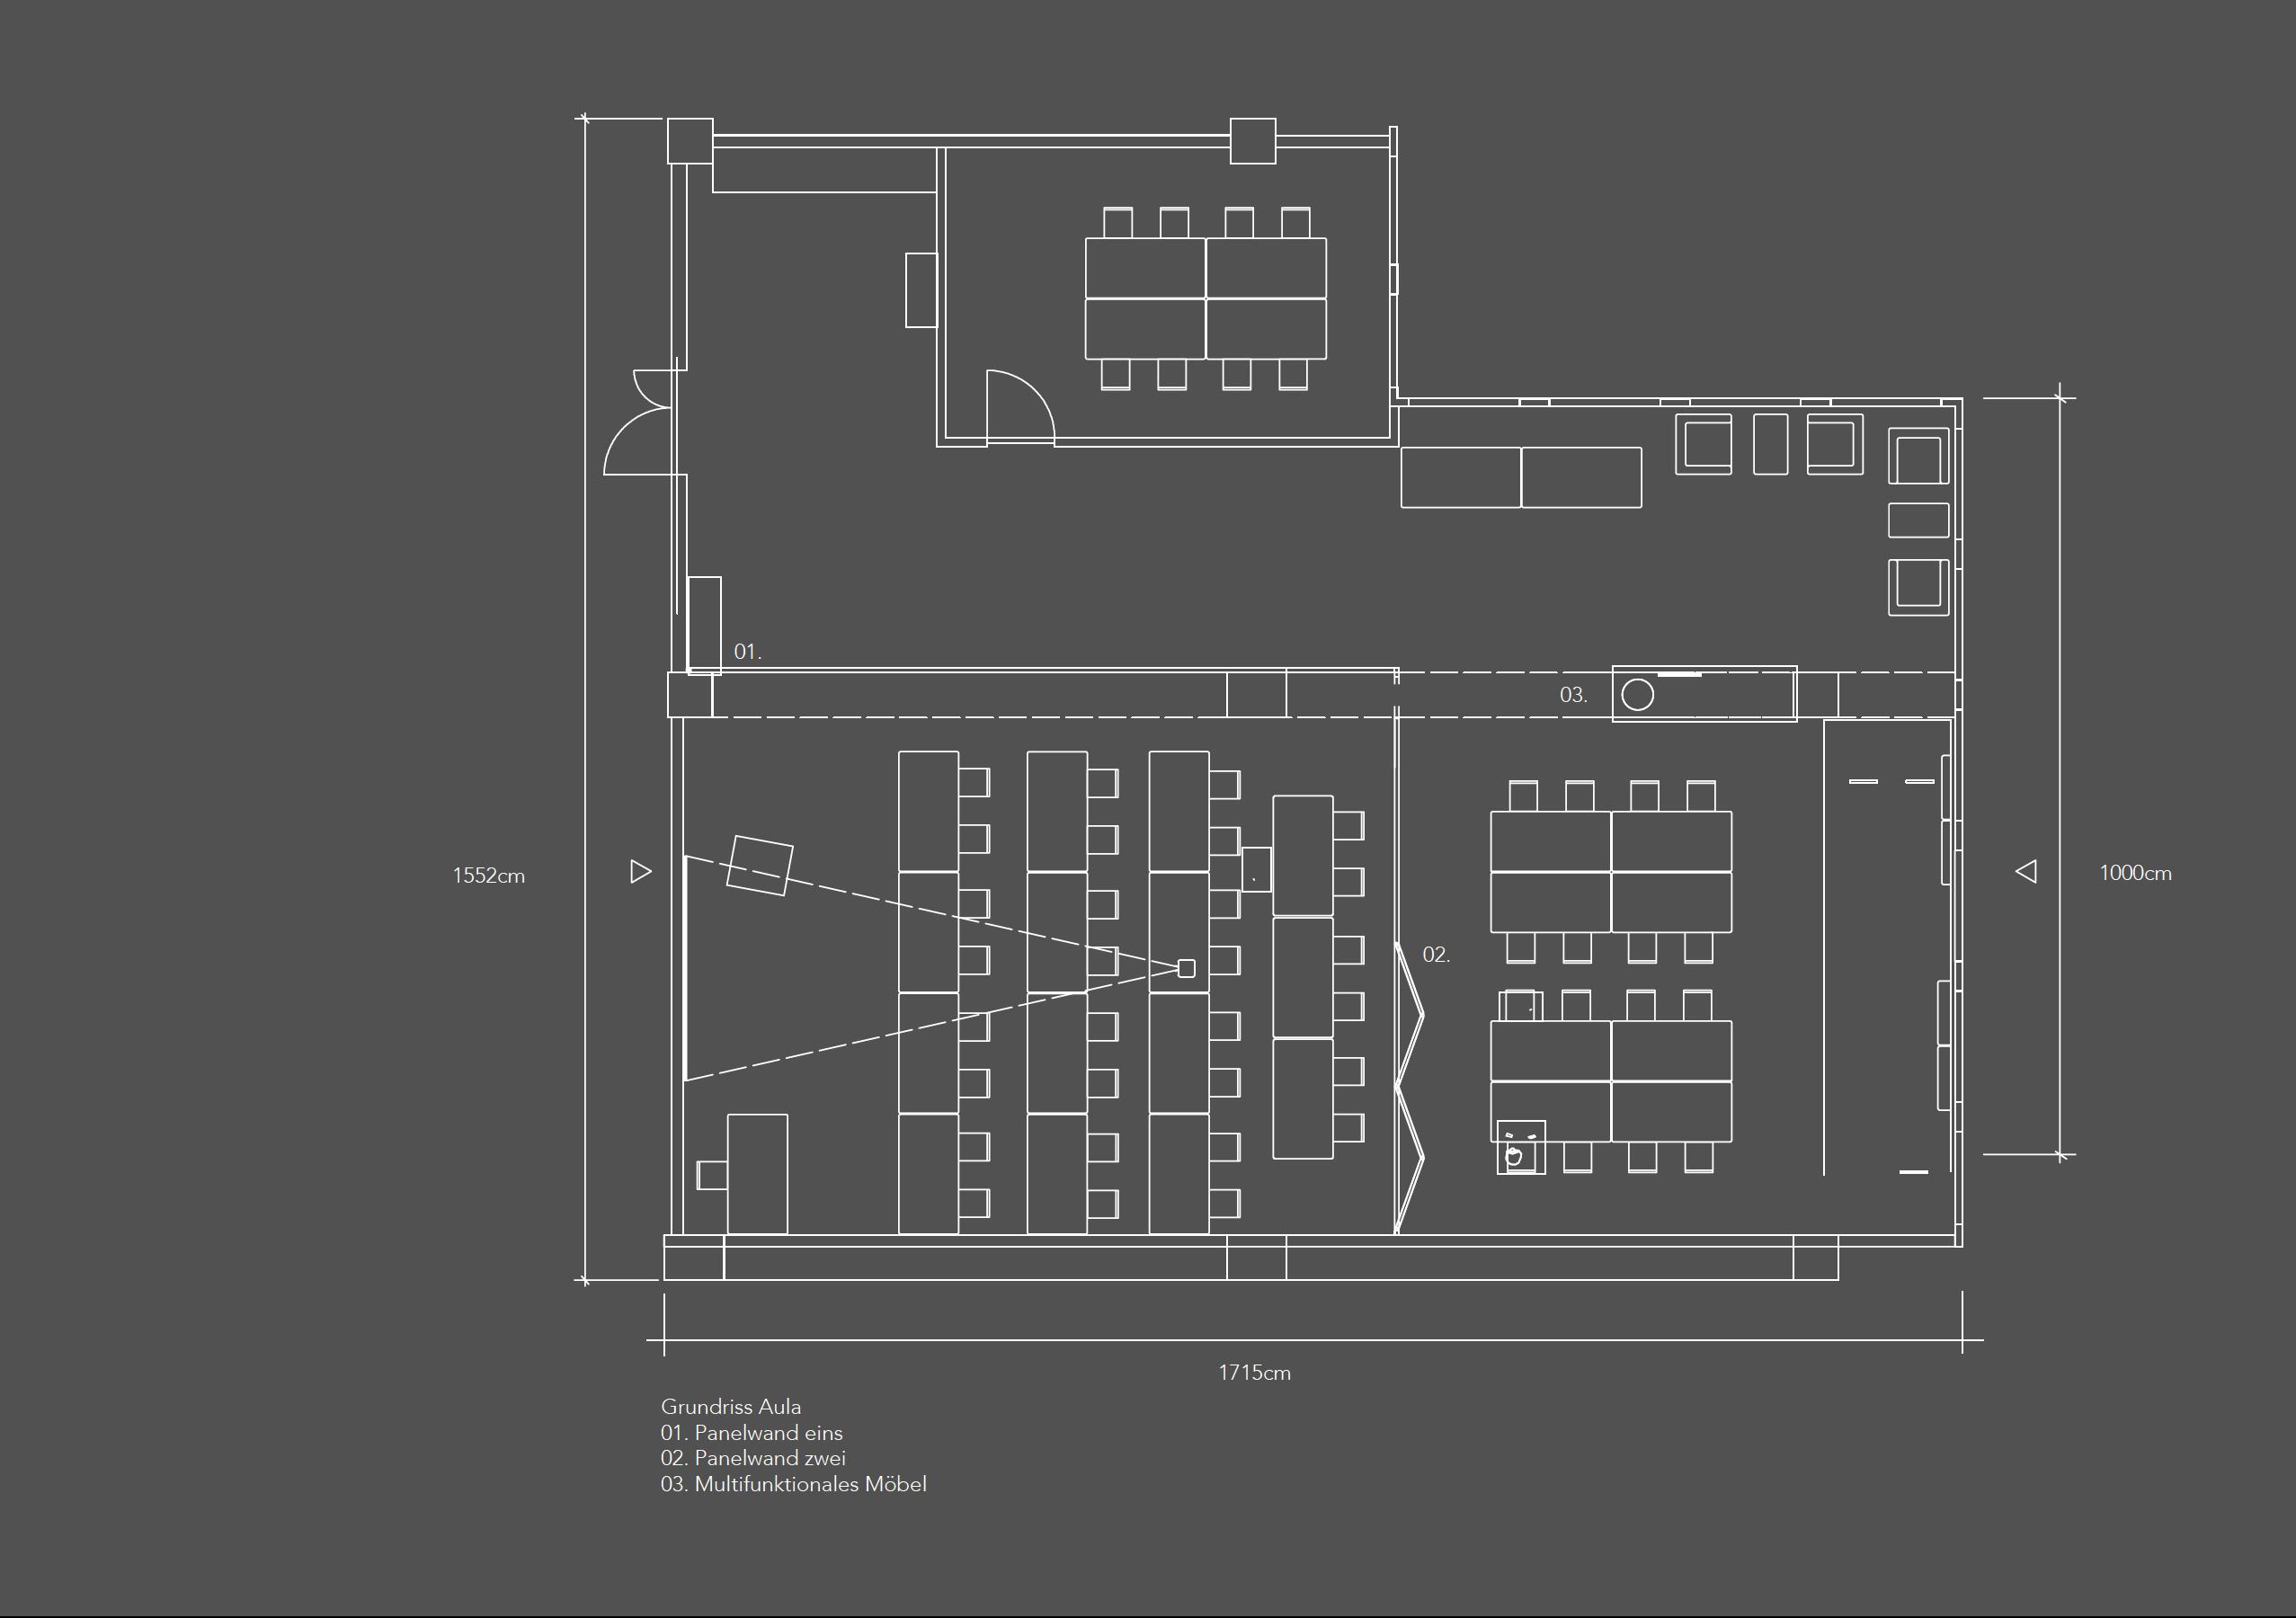 Plan Aula